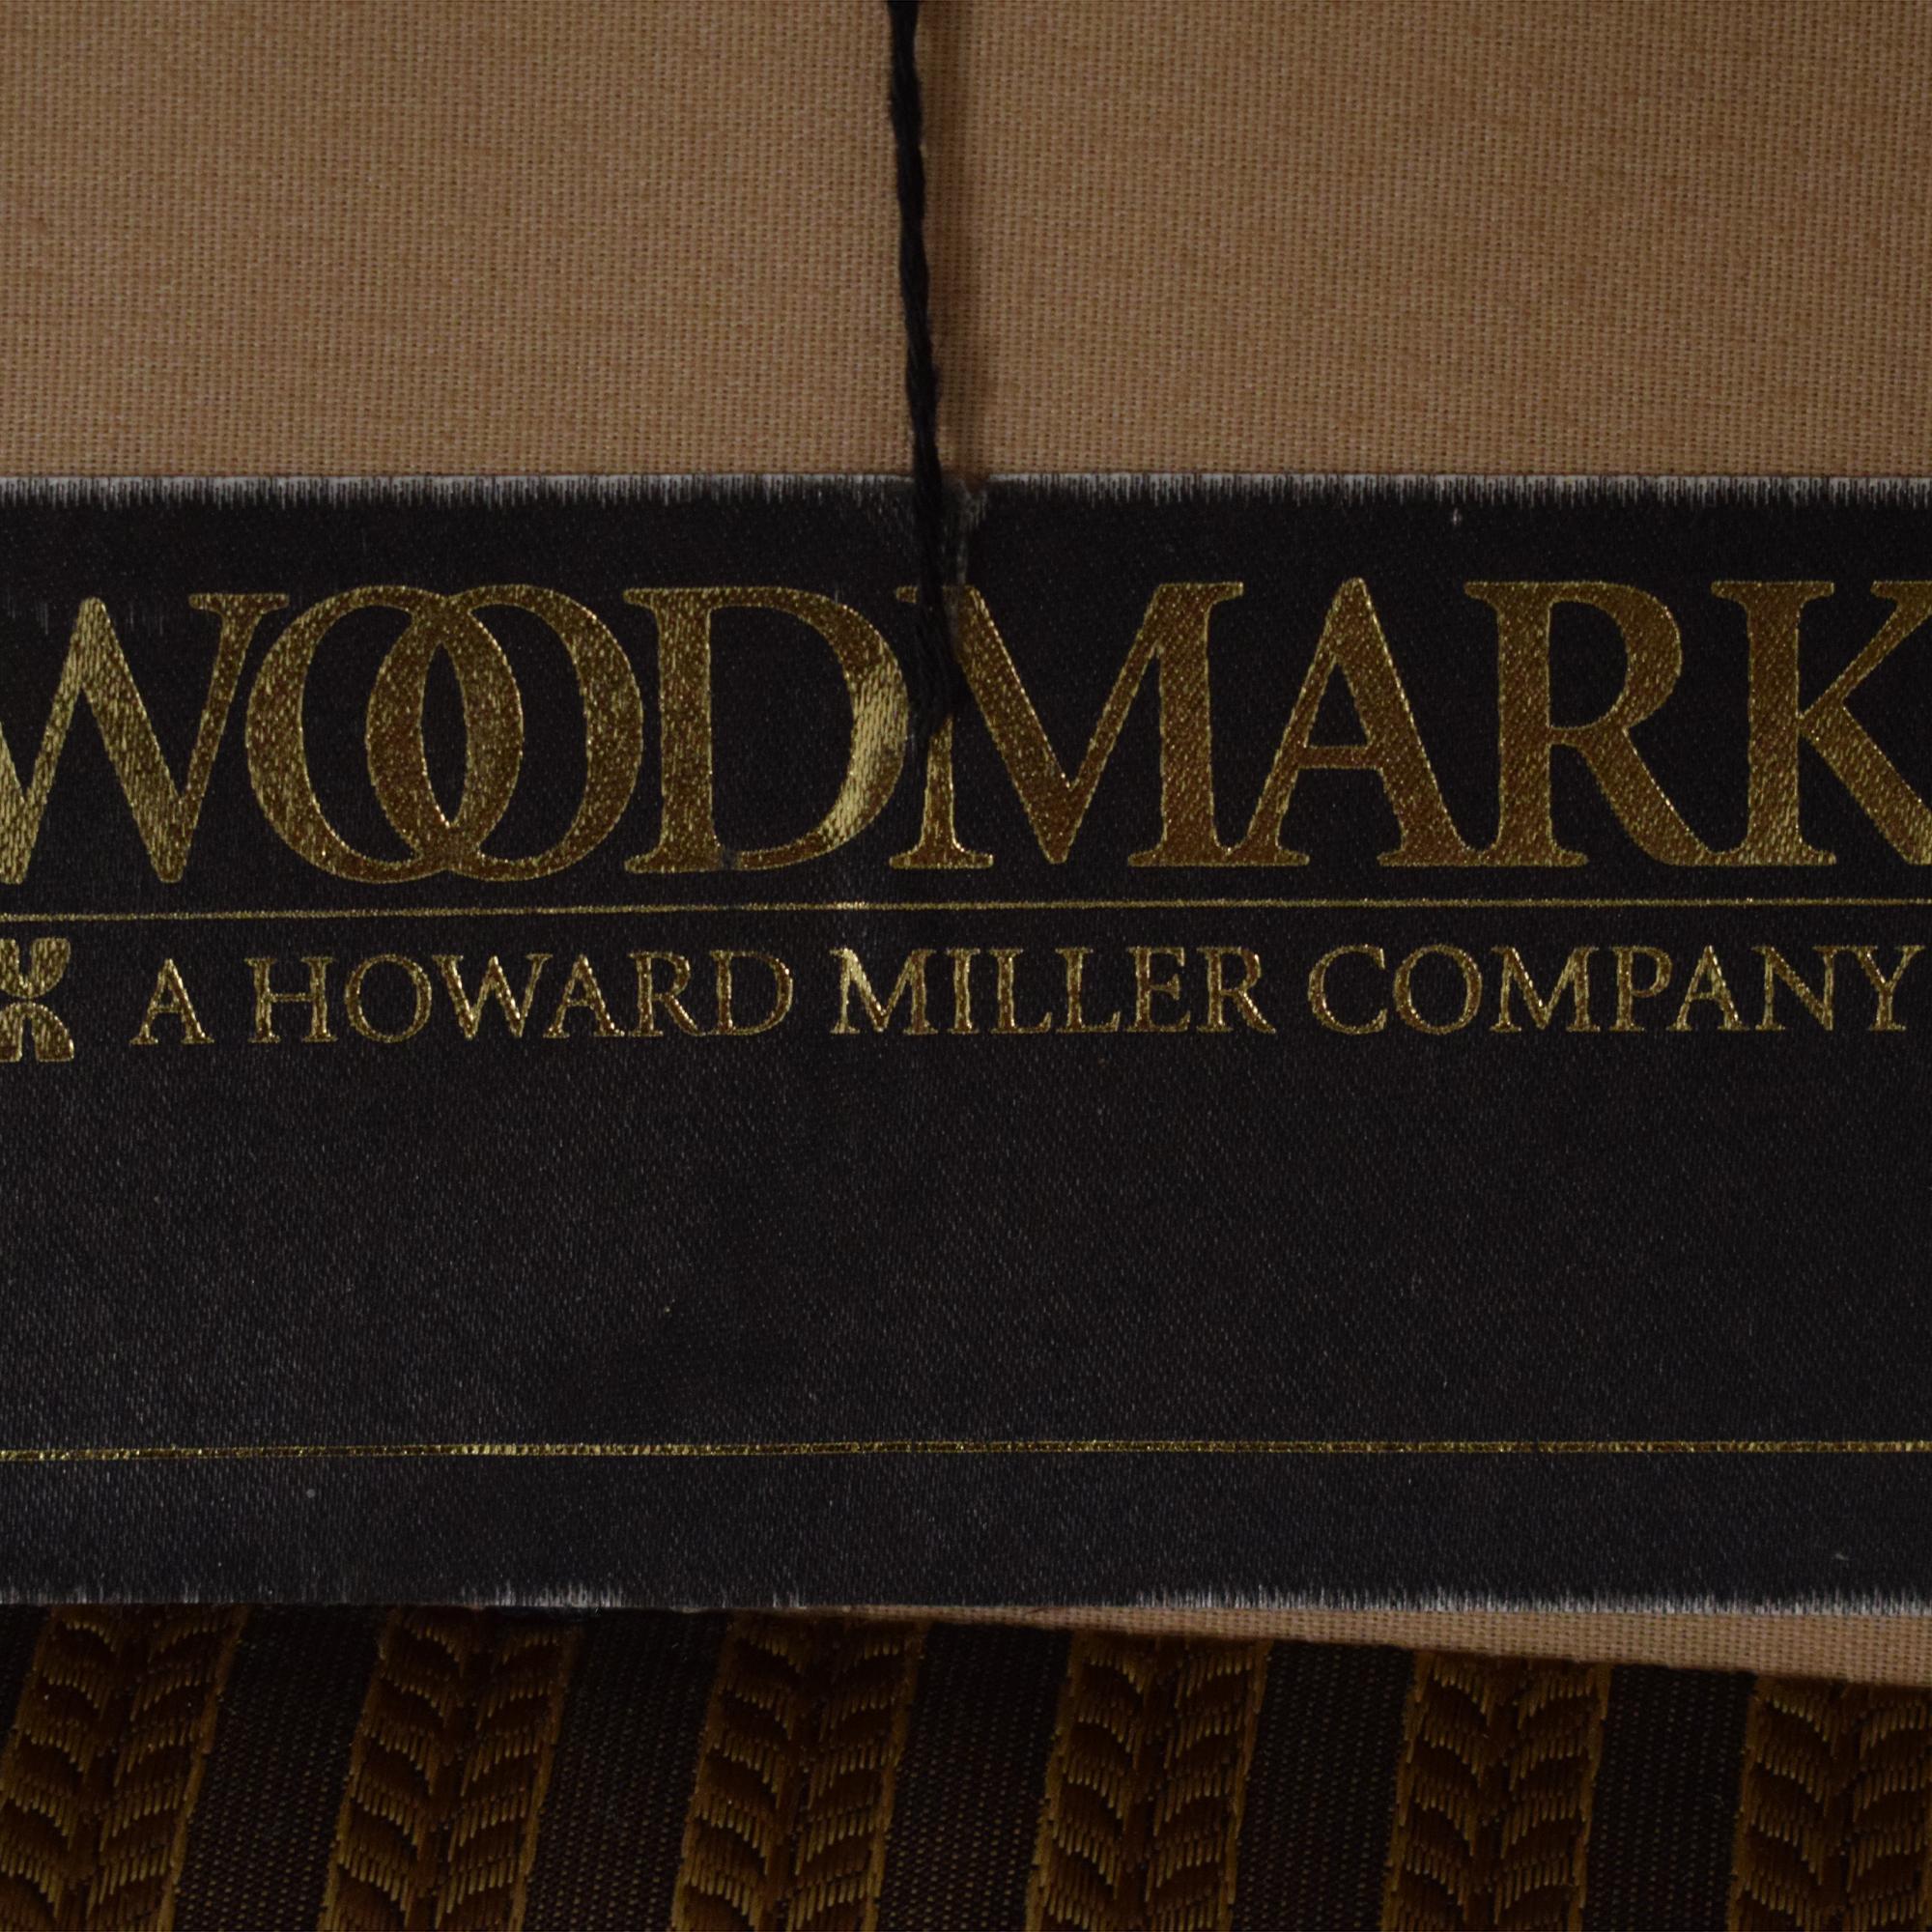 Woodmark Woodmark Swivel Chair dimensions